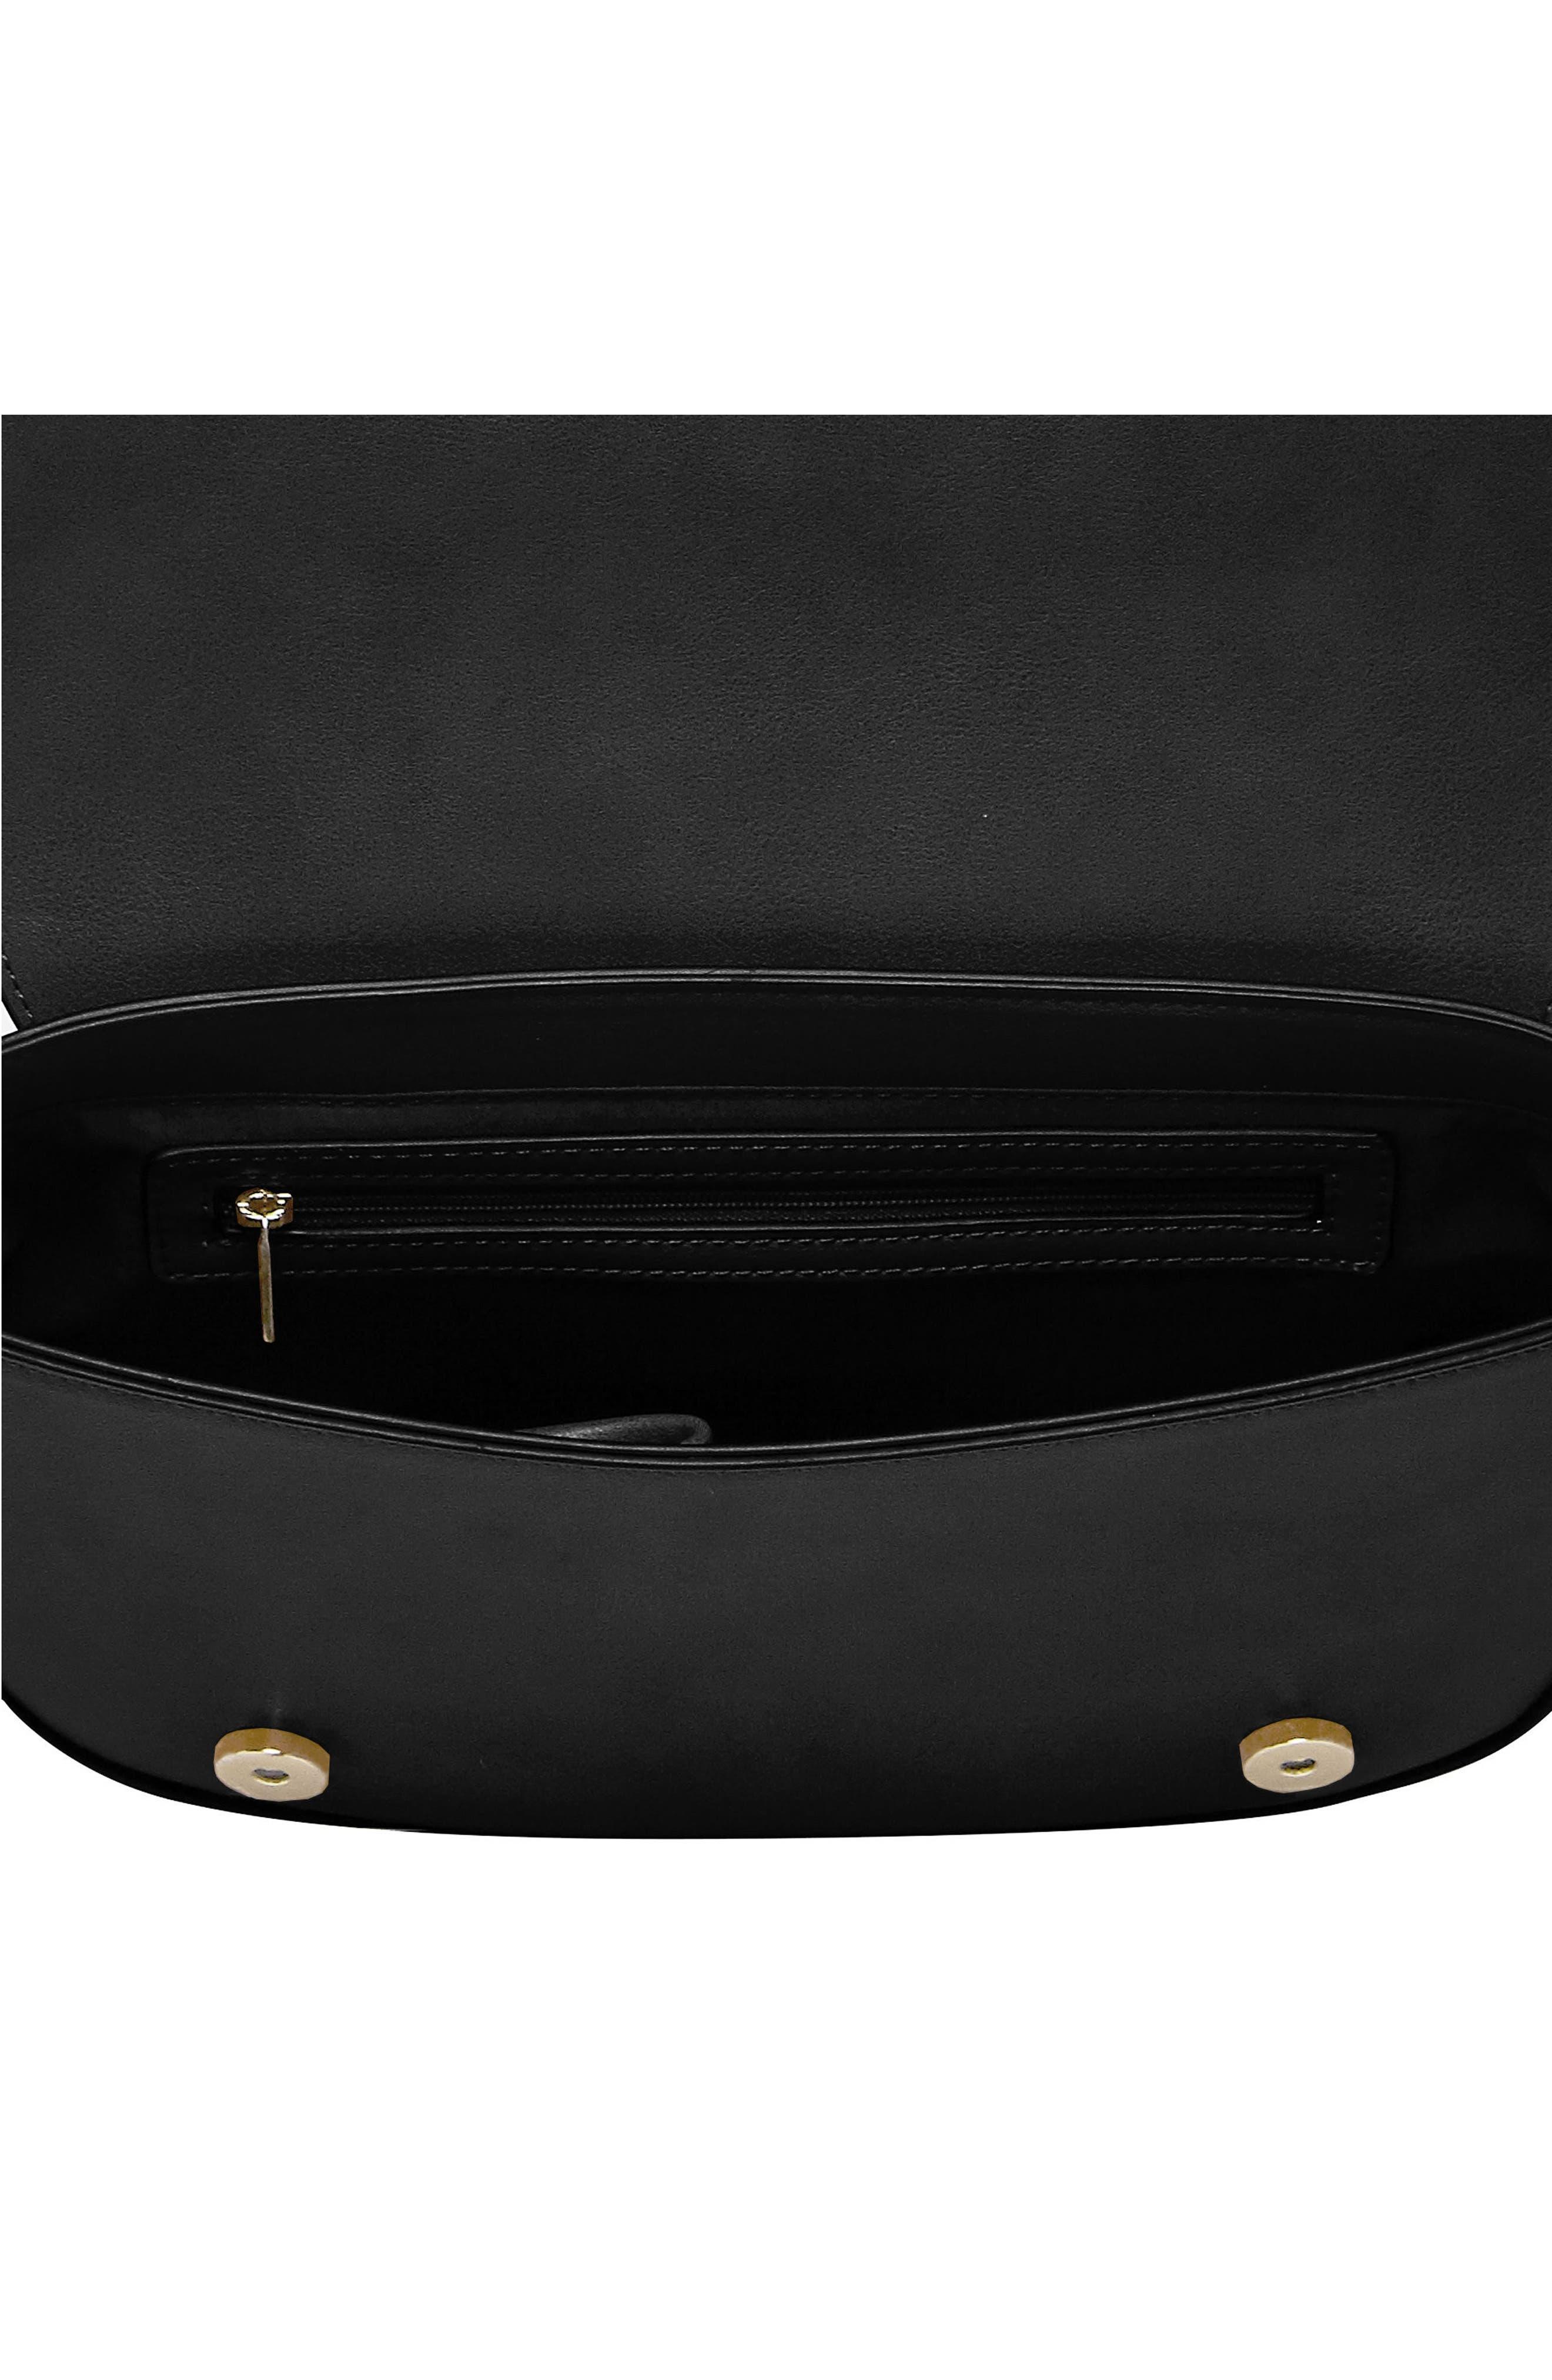 Lola Vegan Leather Crossbody Saddle Bag,                             Alternate thumbnail 2, color,                             001